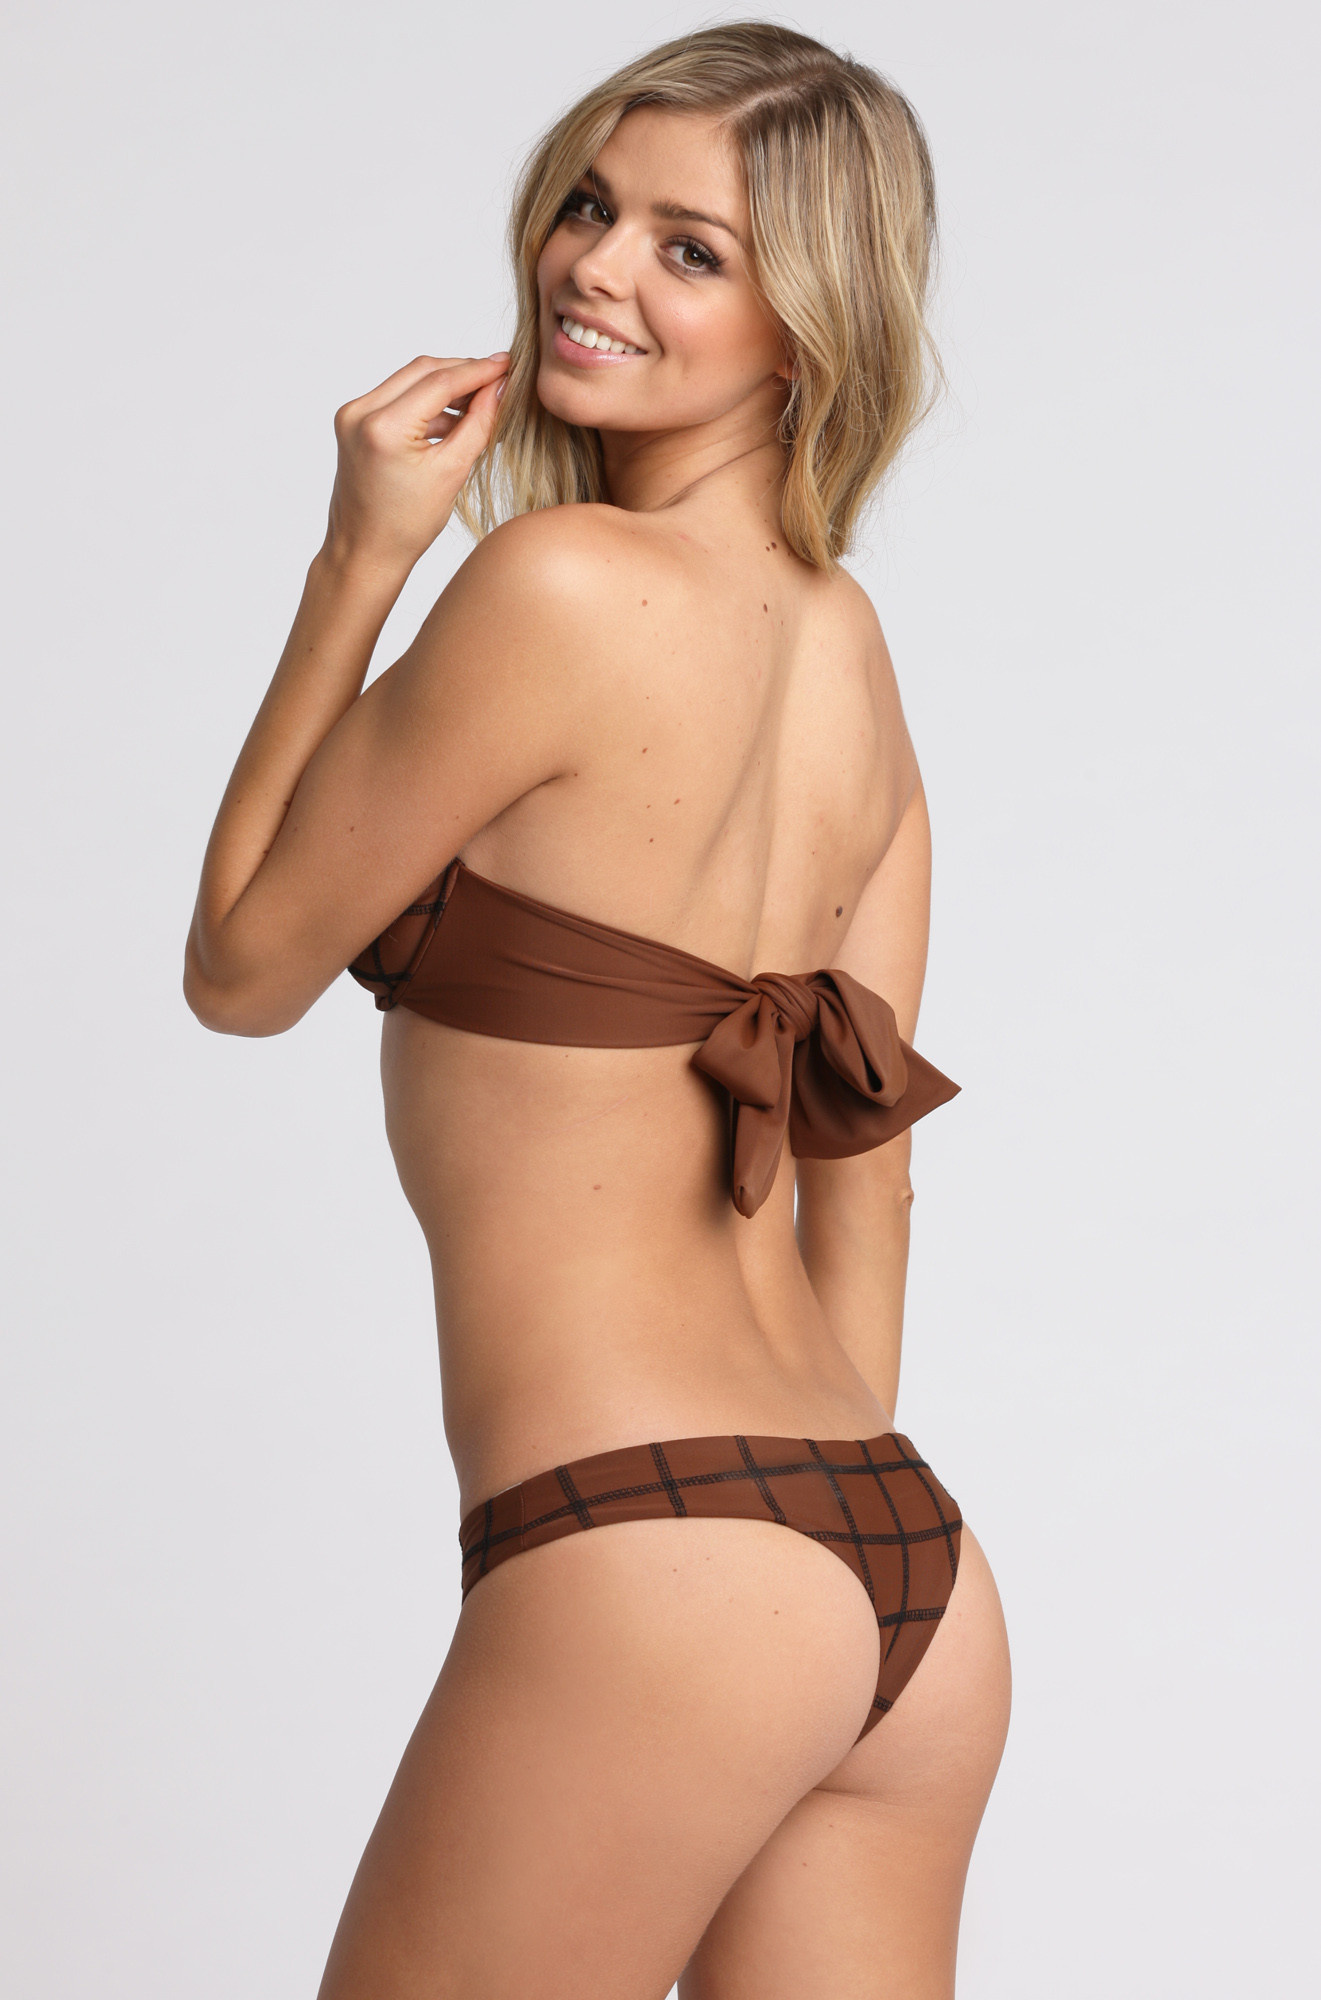 2019 Blanca Brooke nude (43 photo), Pussy, Bikini, Selfie, butt 2017